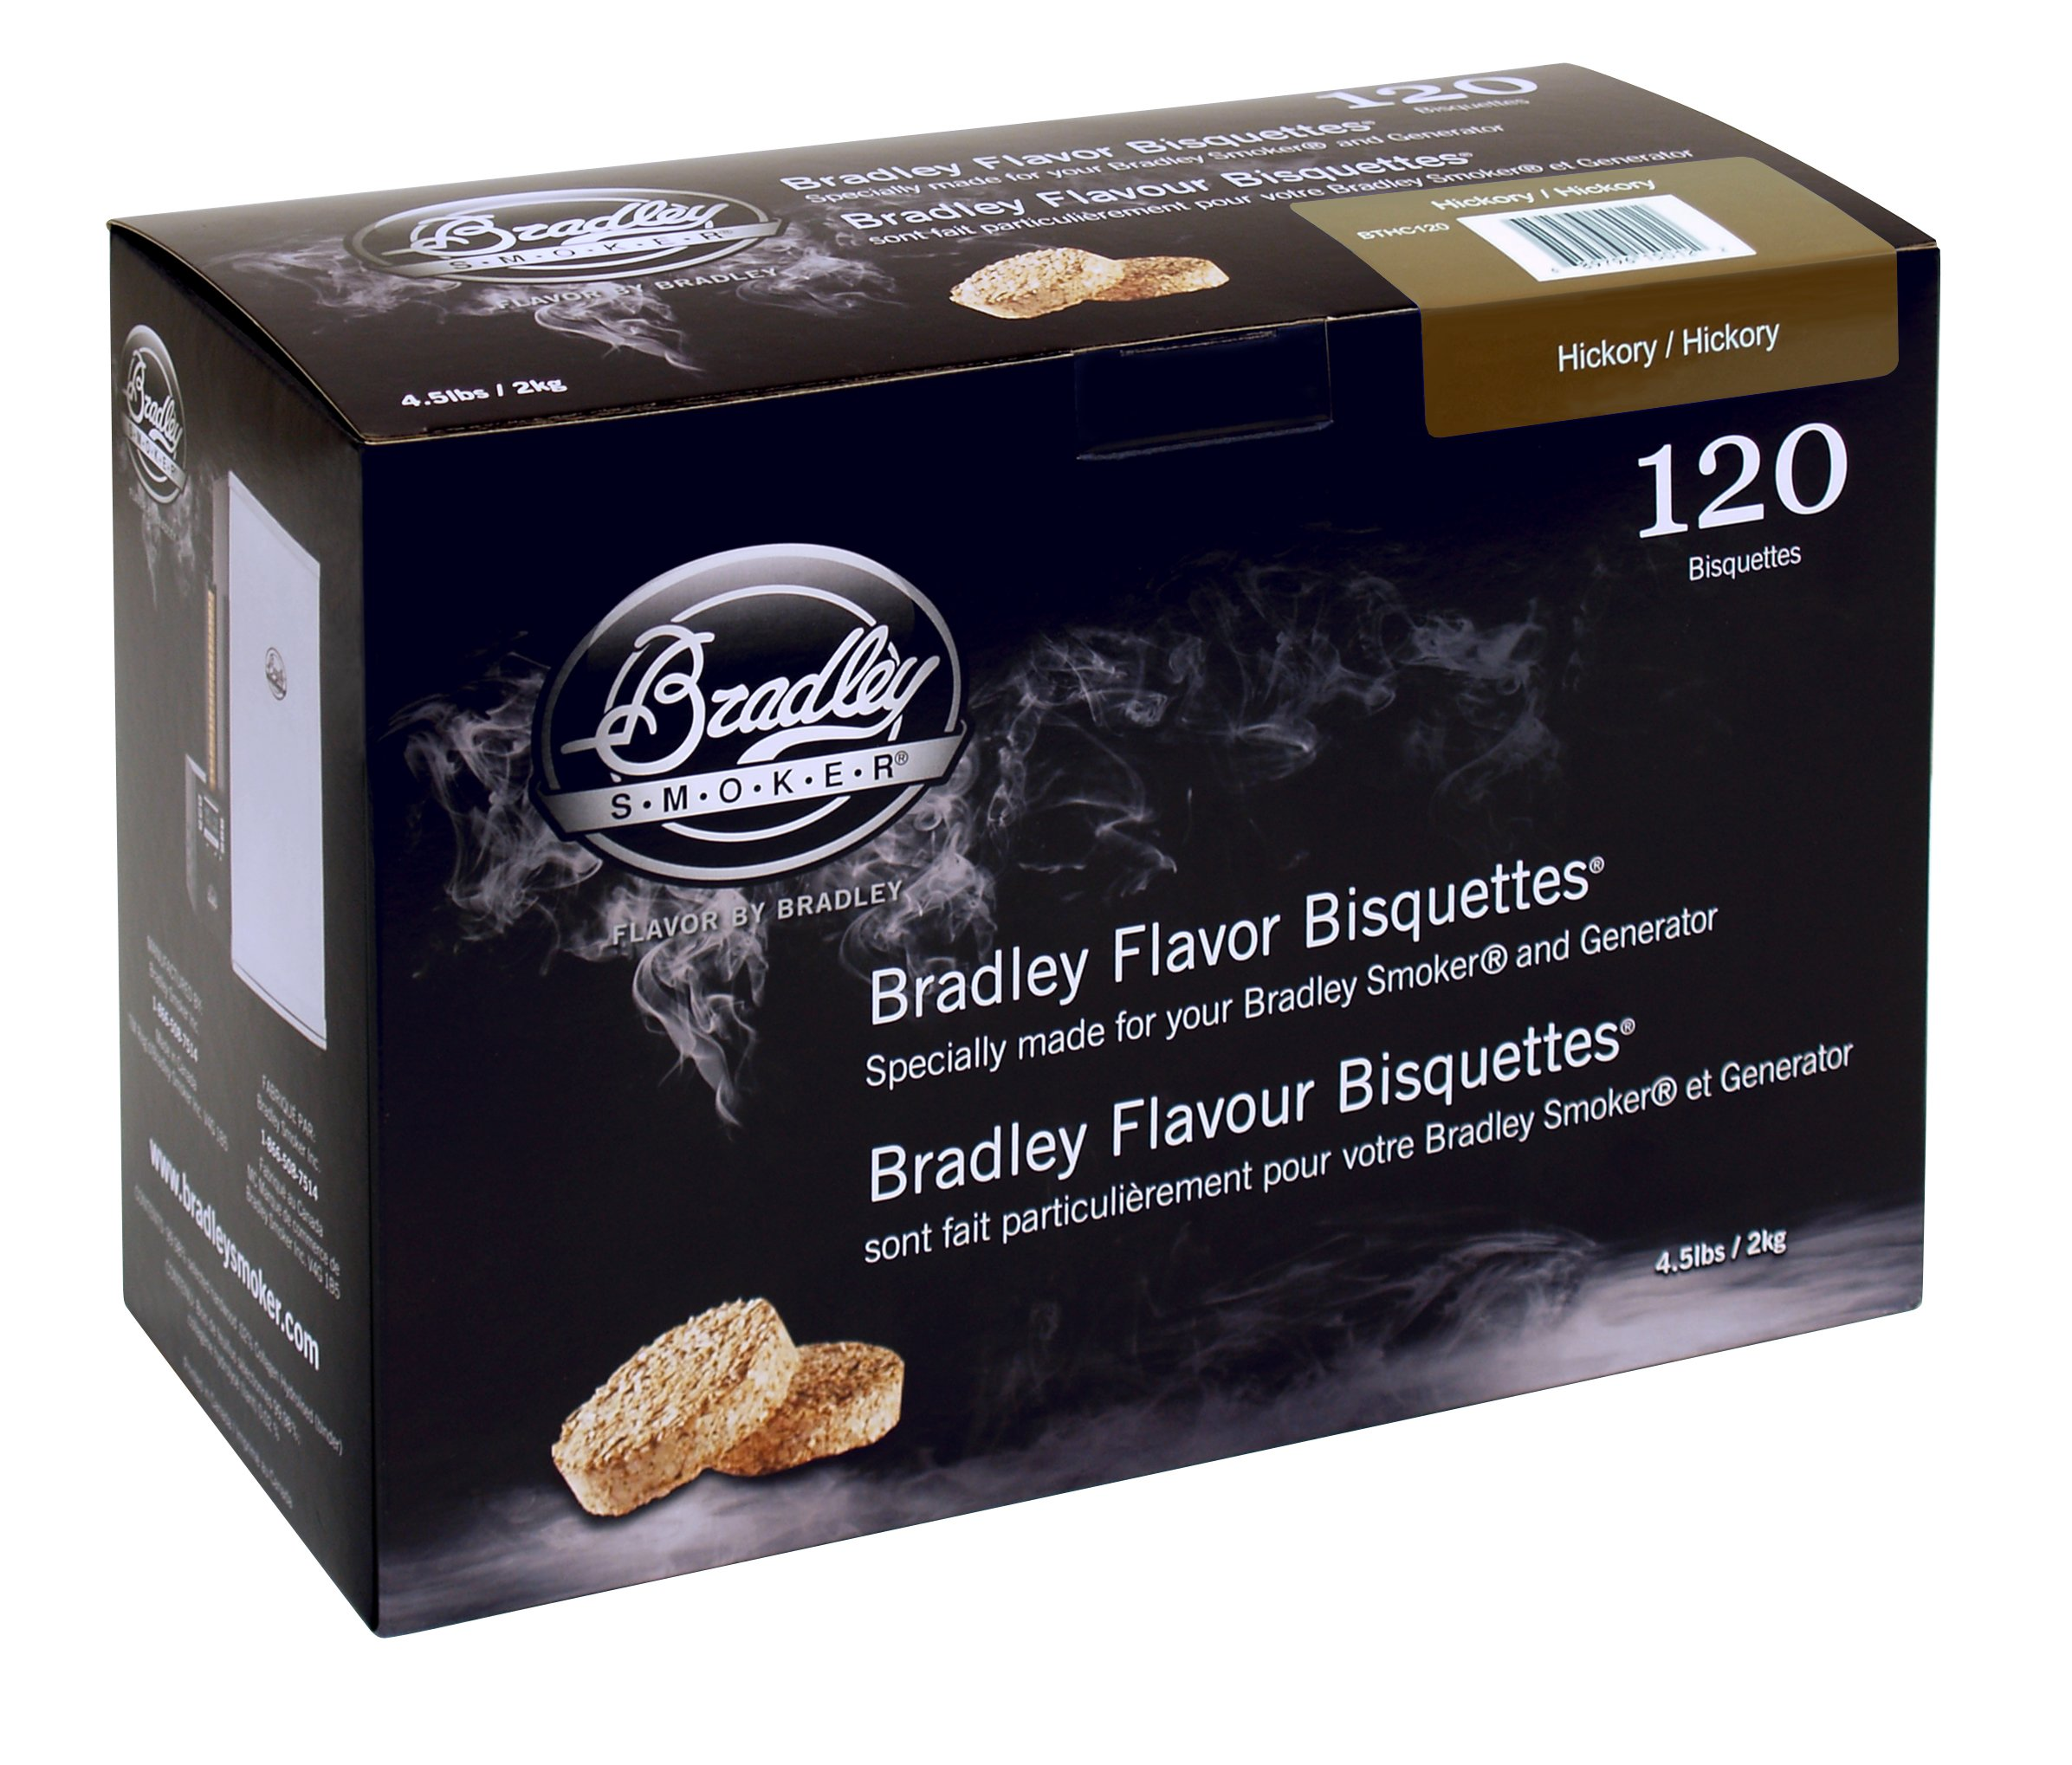 Bradley Smoker BTHC120 Hickory Bisquettes 120 pack by Bradley Smoker